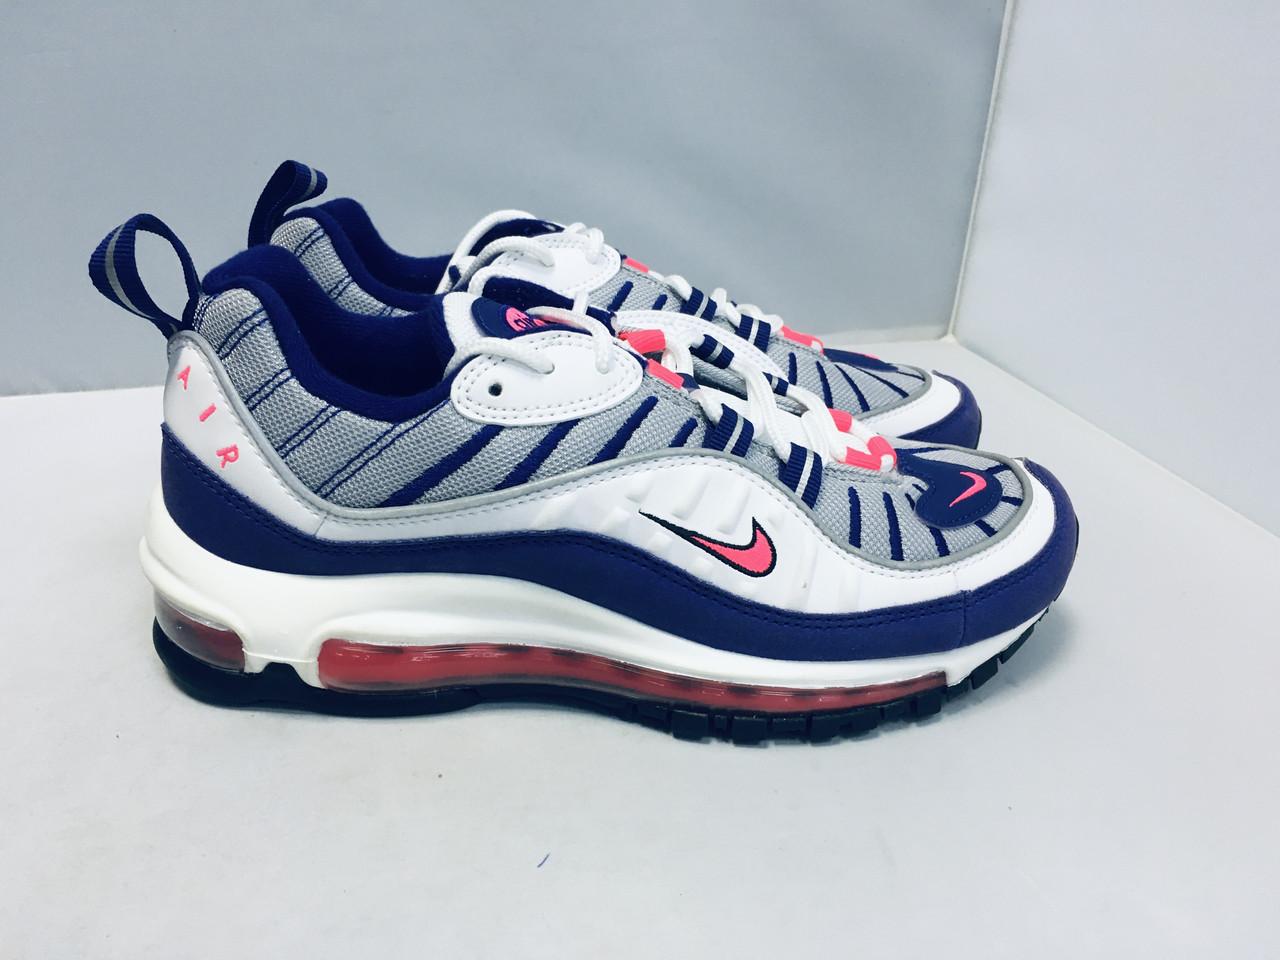 Женские кроссовки Nike Air Max, 37,5 размер